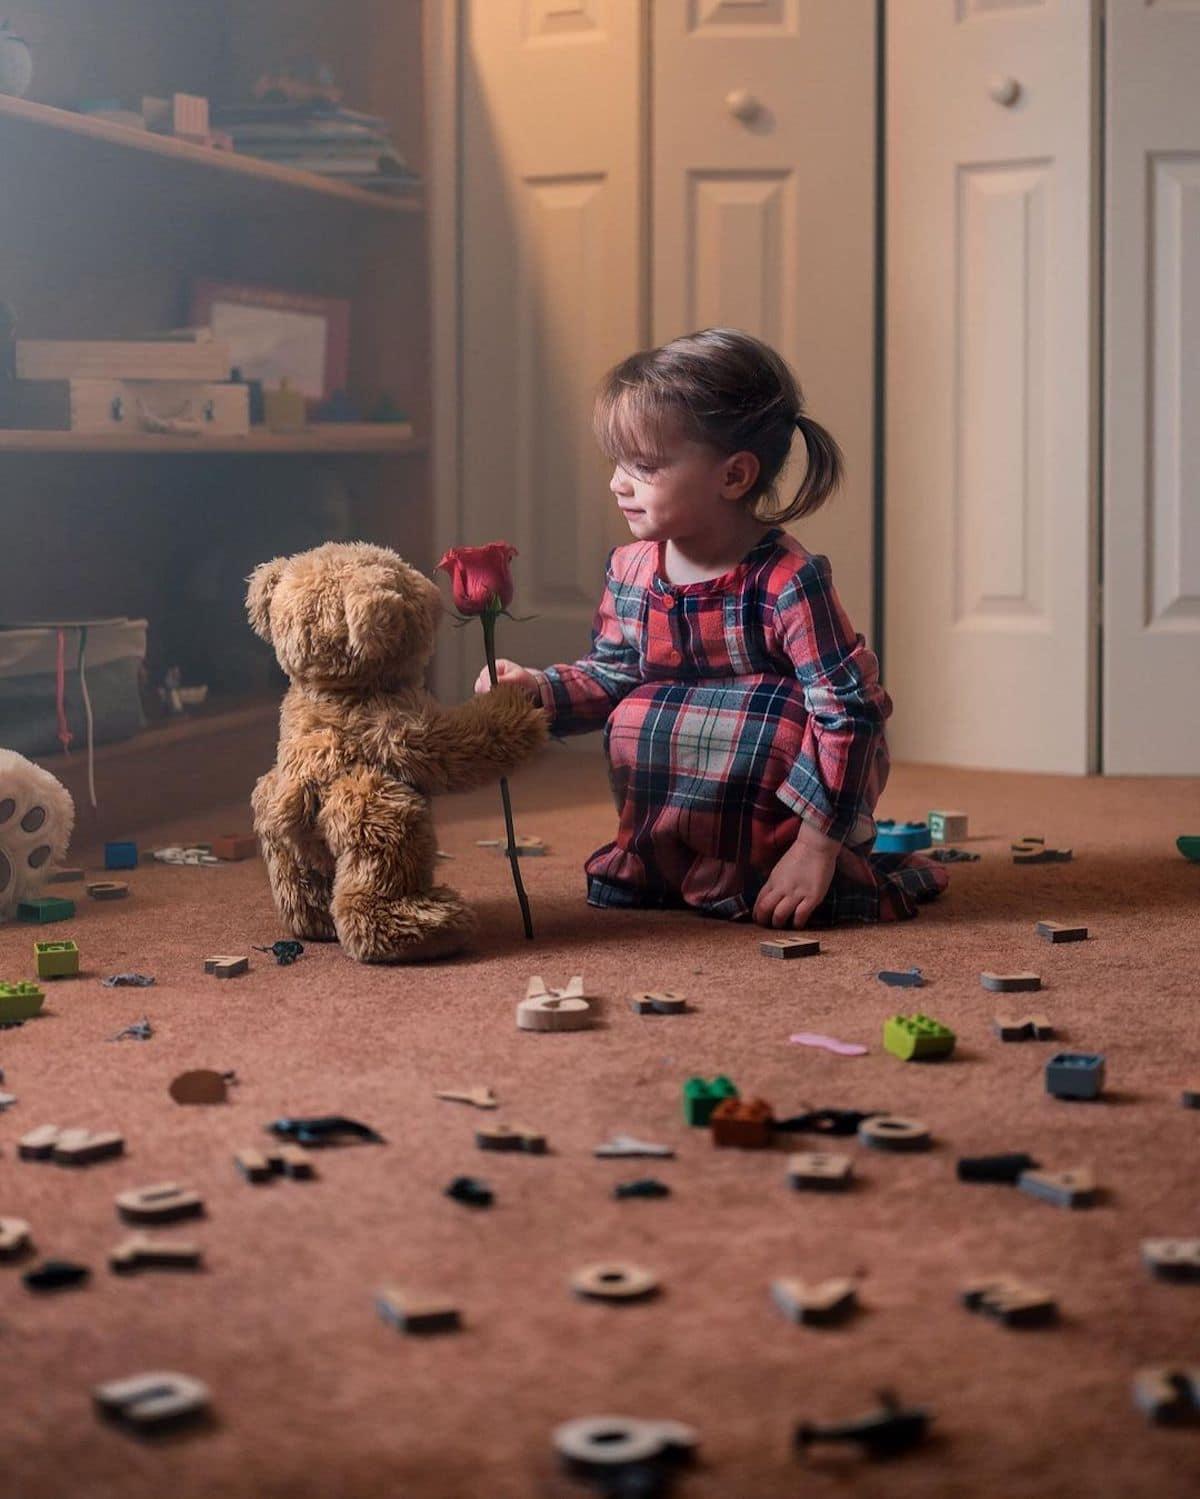 Girl Talking to Stuffed Animals